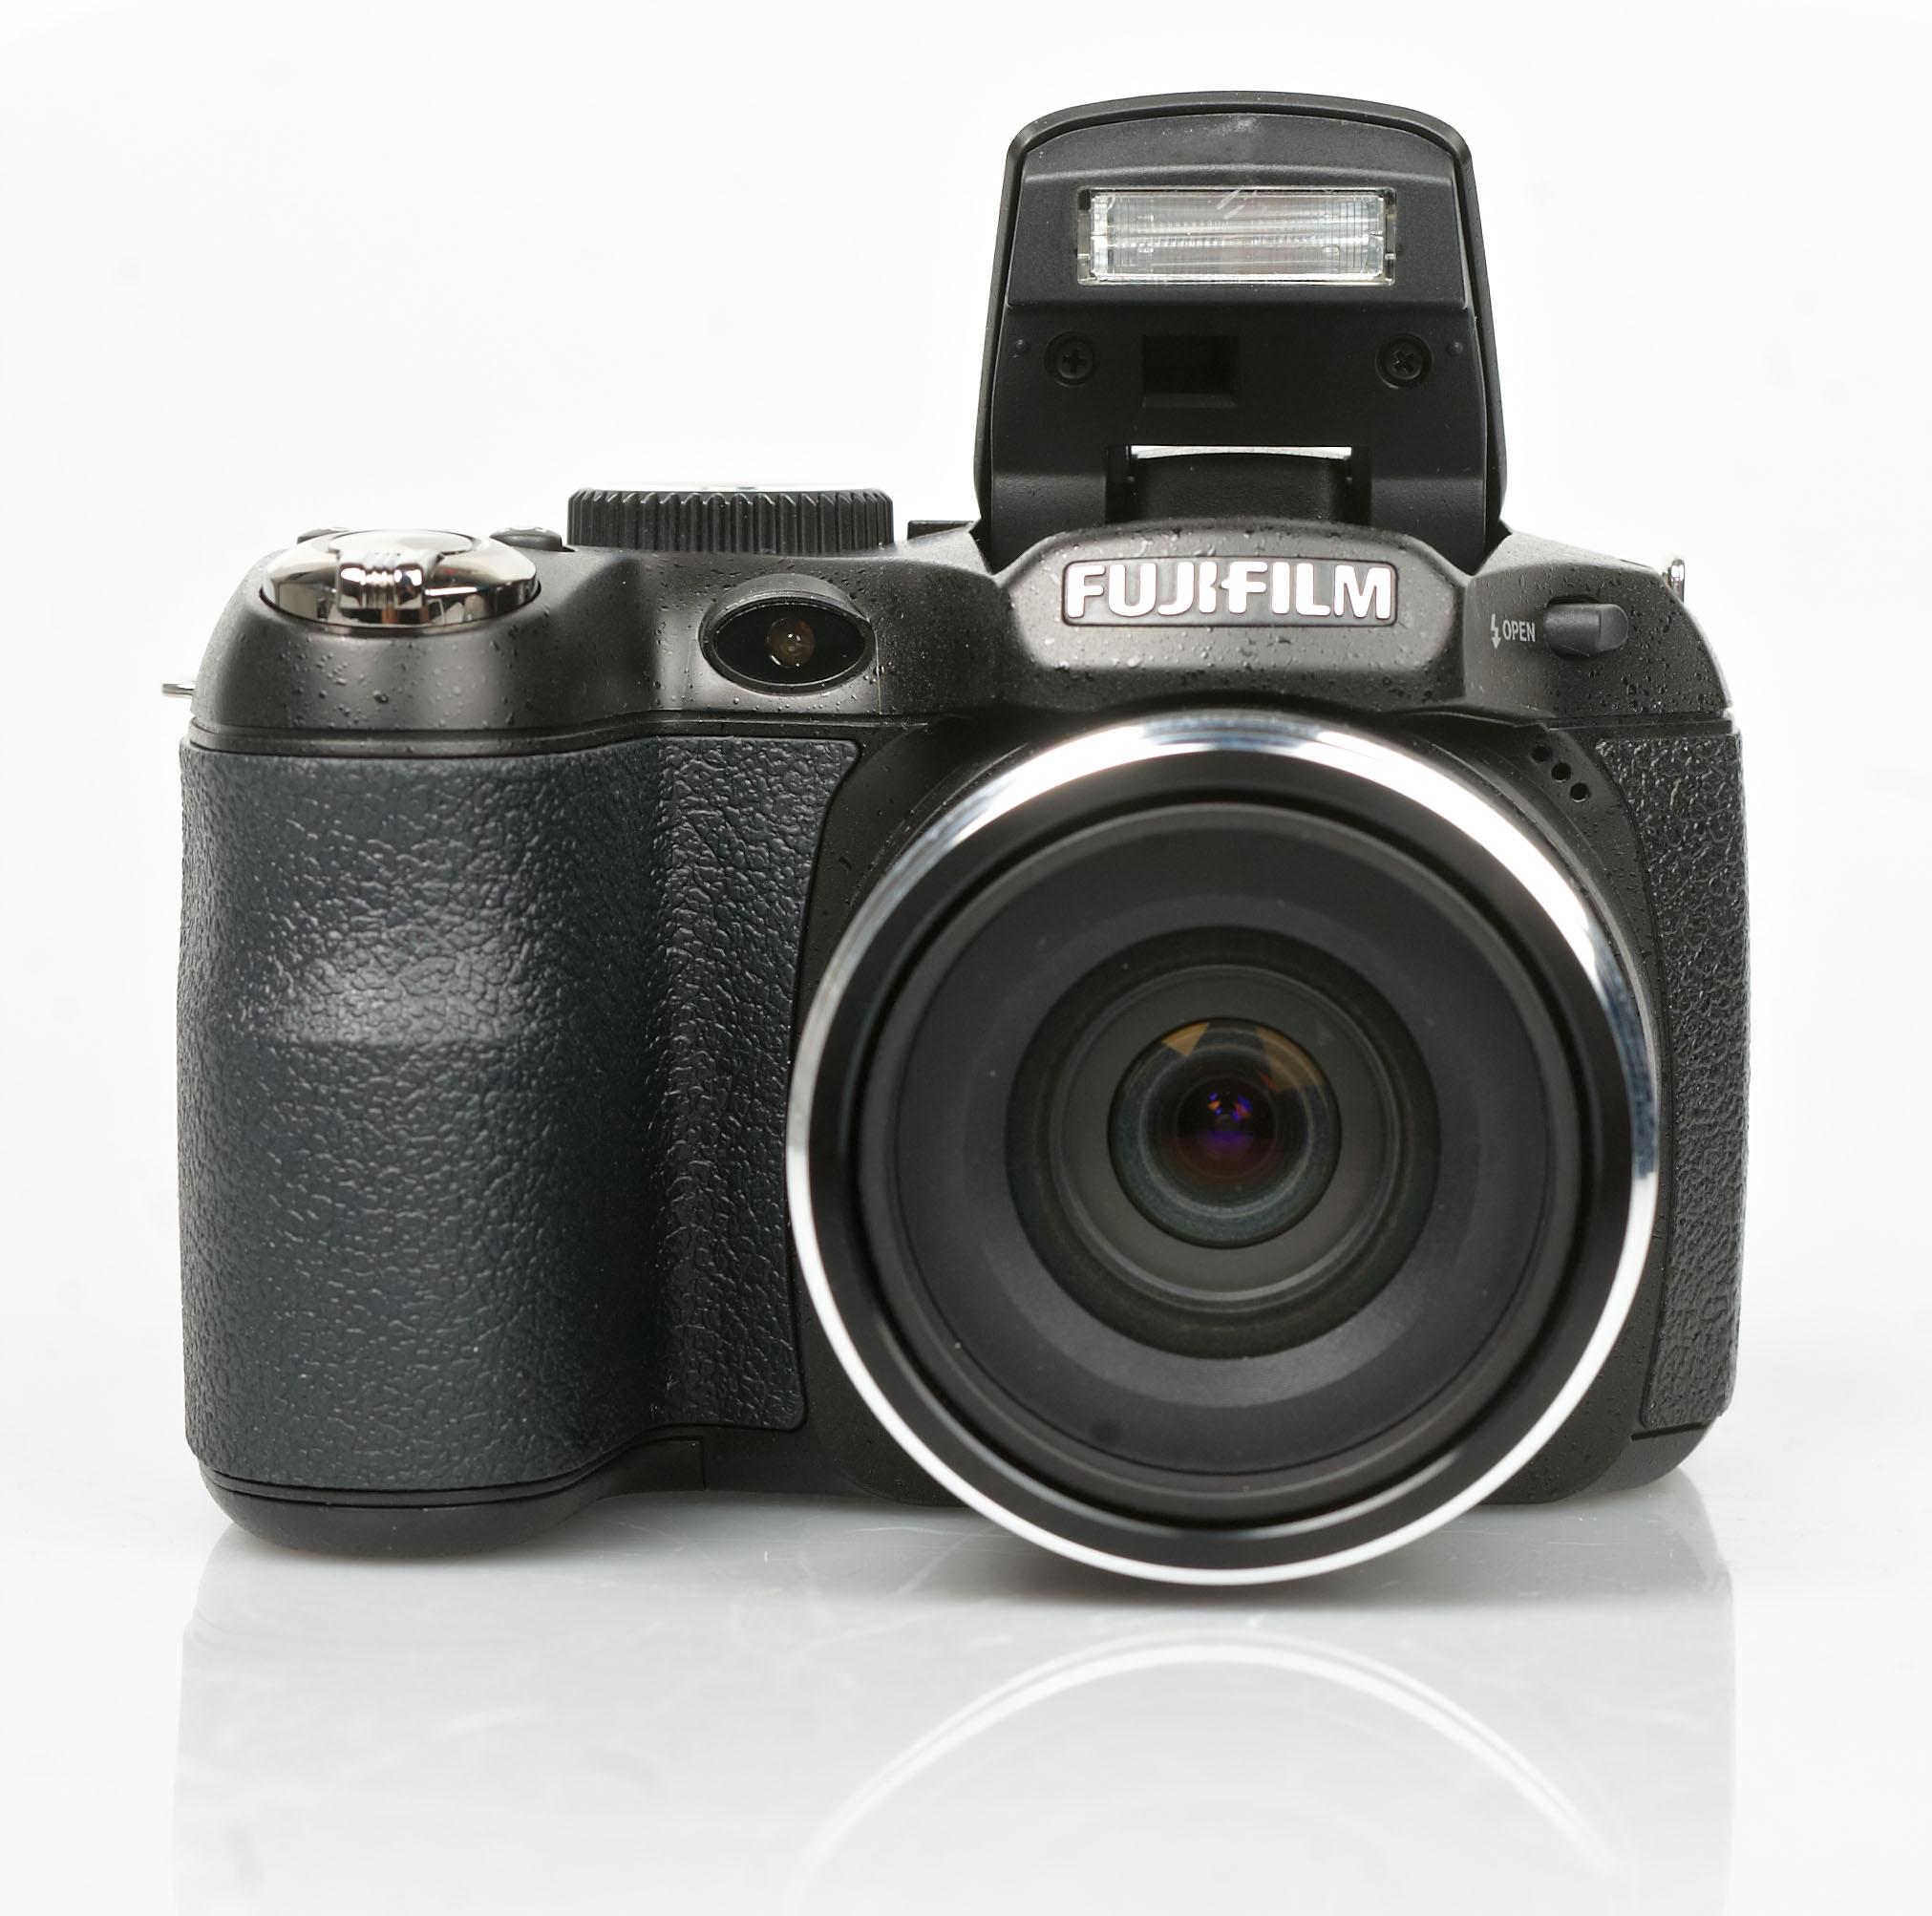 fujifilm finepix s2500hd digital camera review rh ephotozine com Fujifilm FinePix XP Fujifilm FinePix Camera Manual